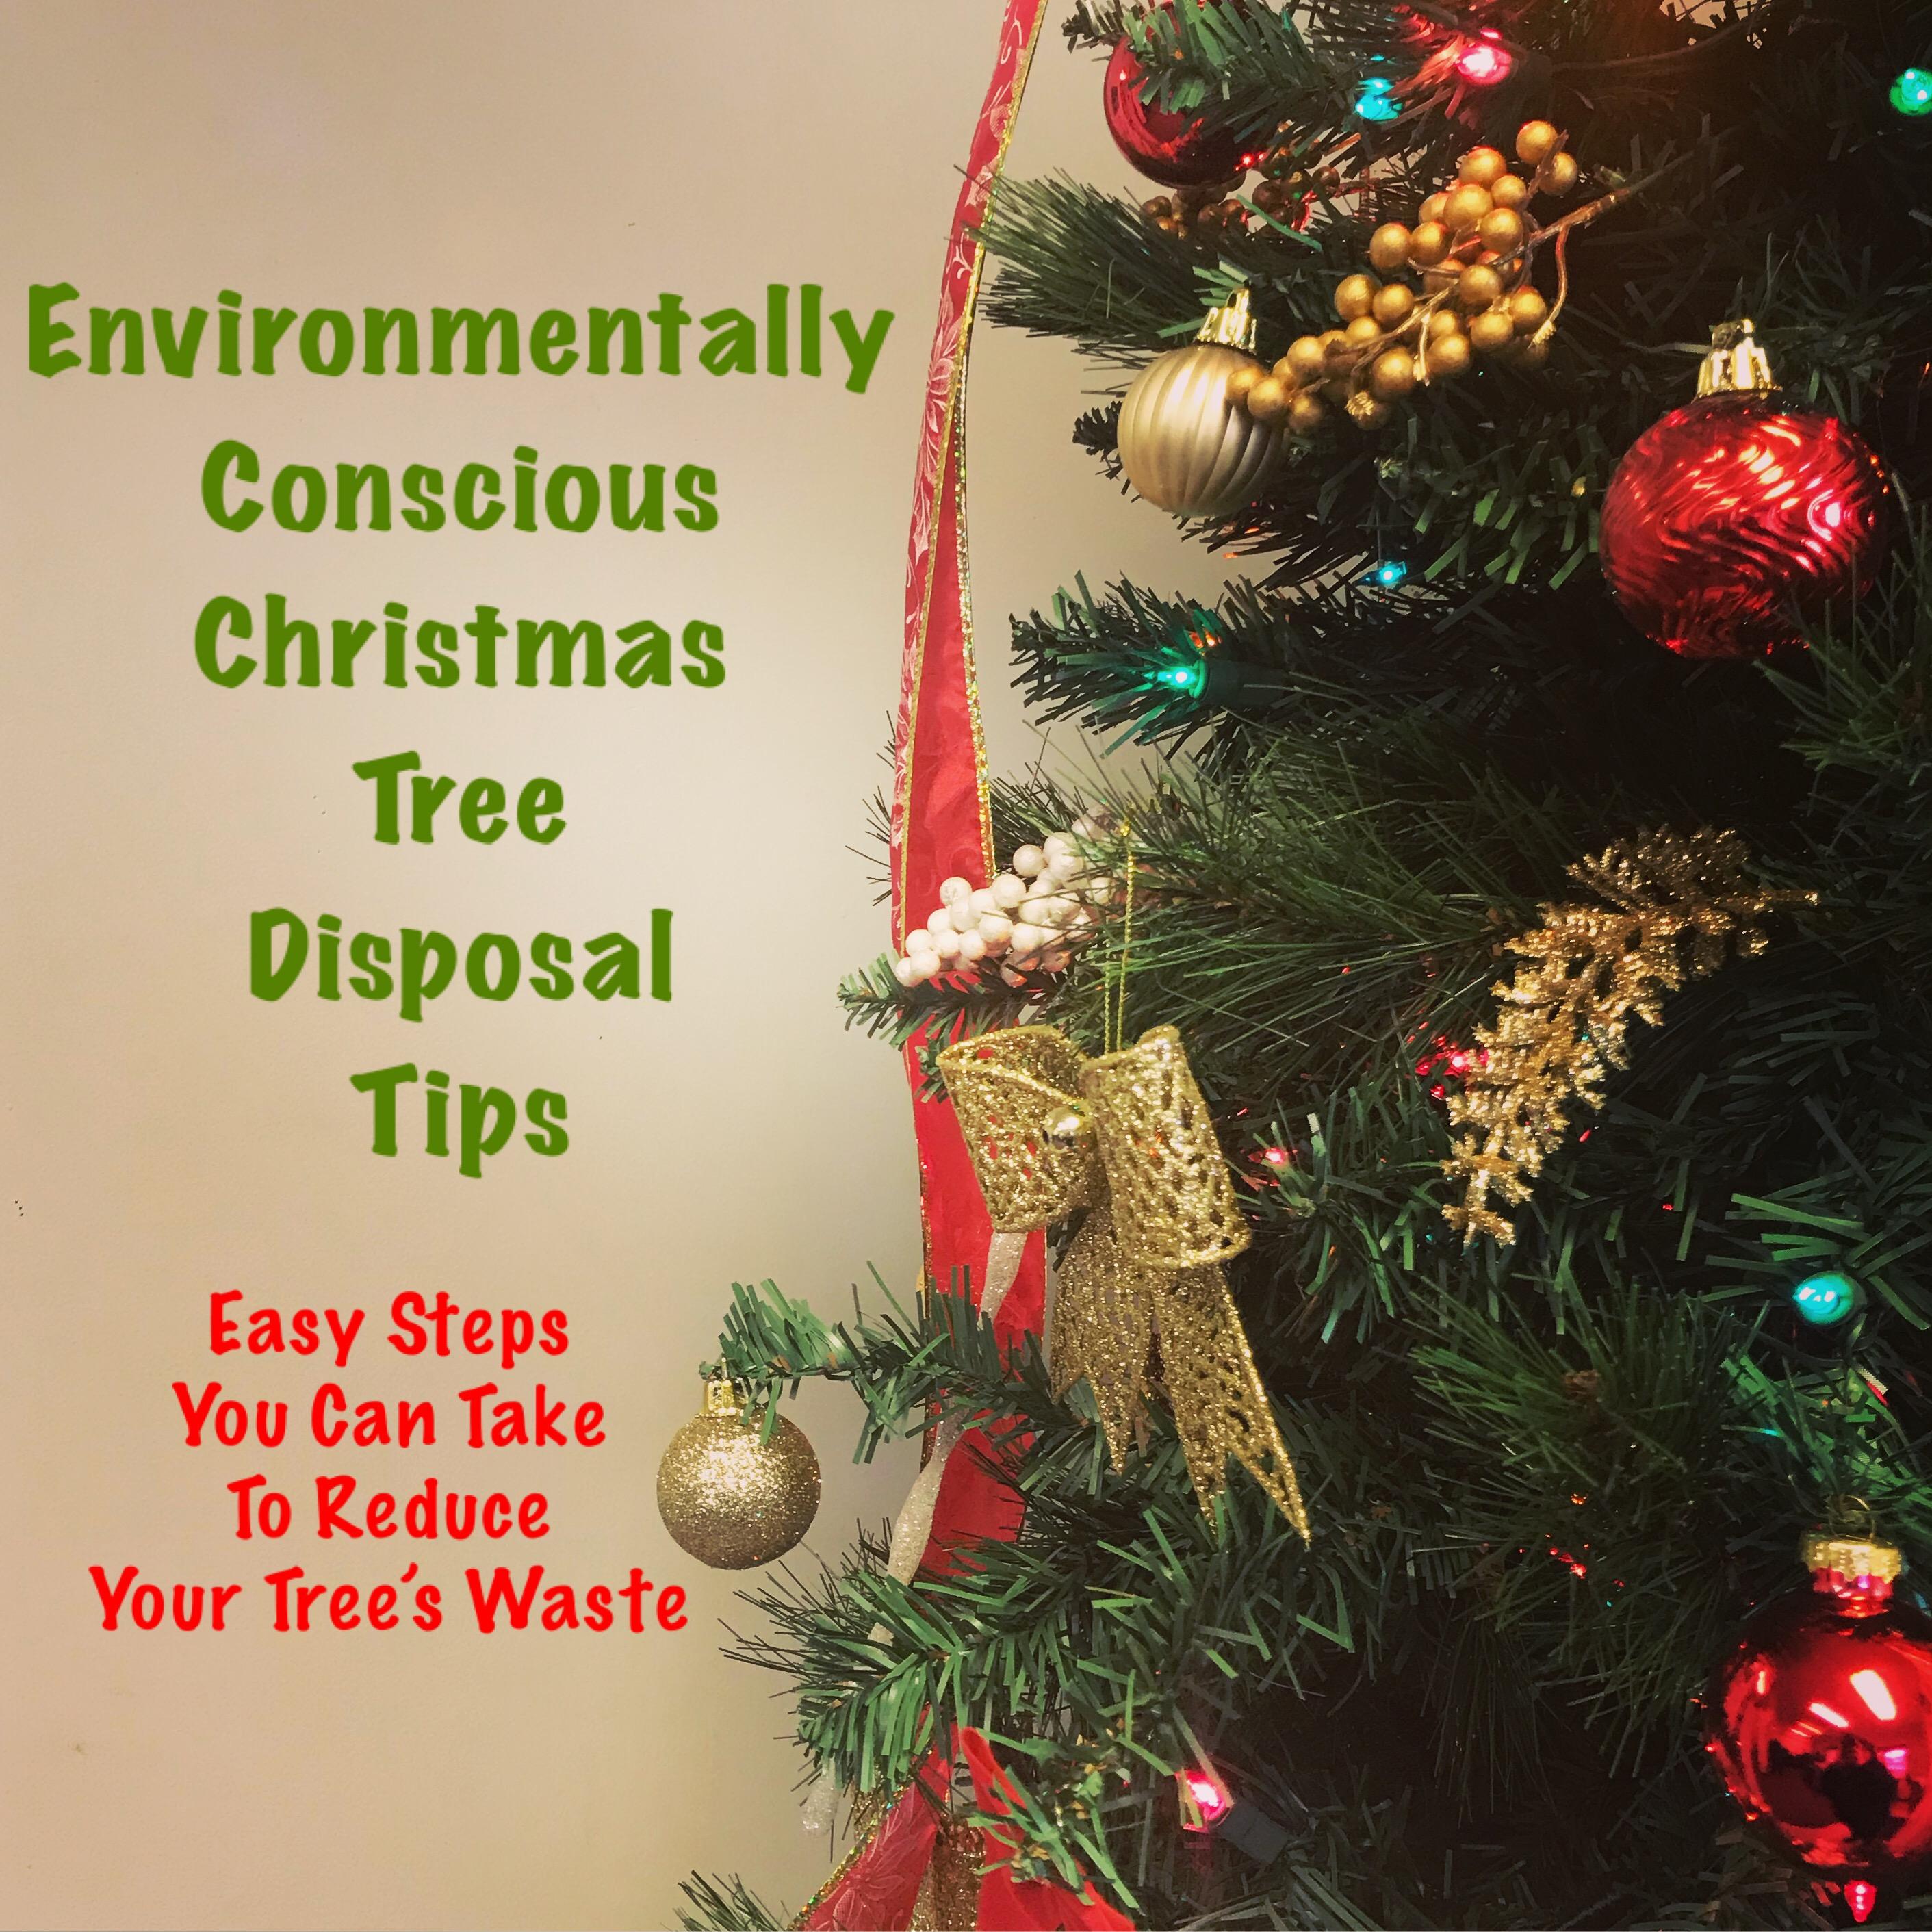 Environmentally Conscious Christmas Tree Disposal Tips.jpg